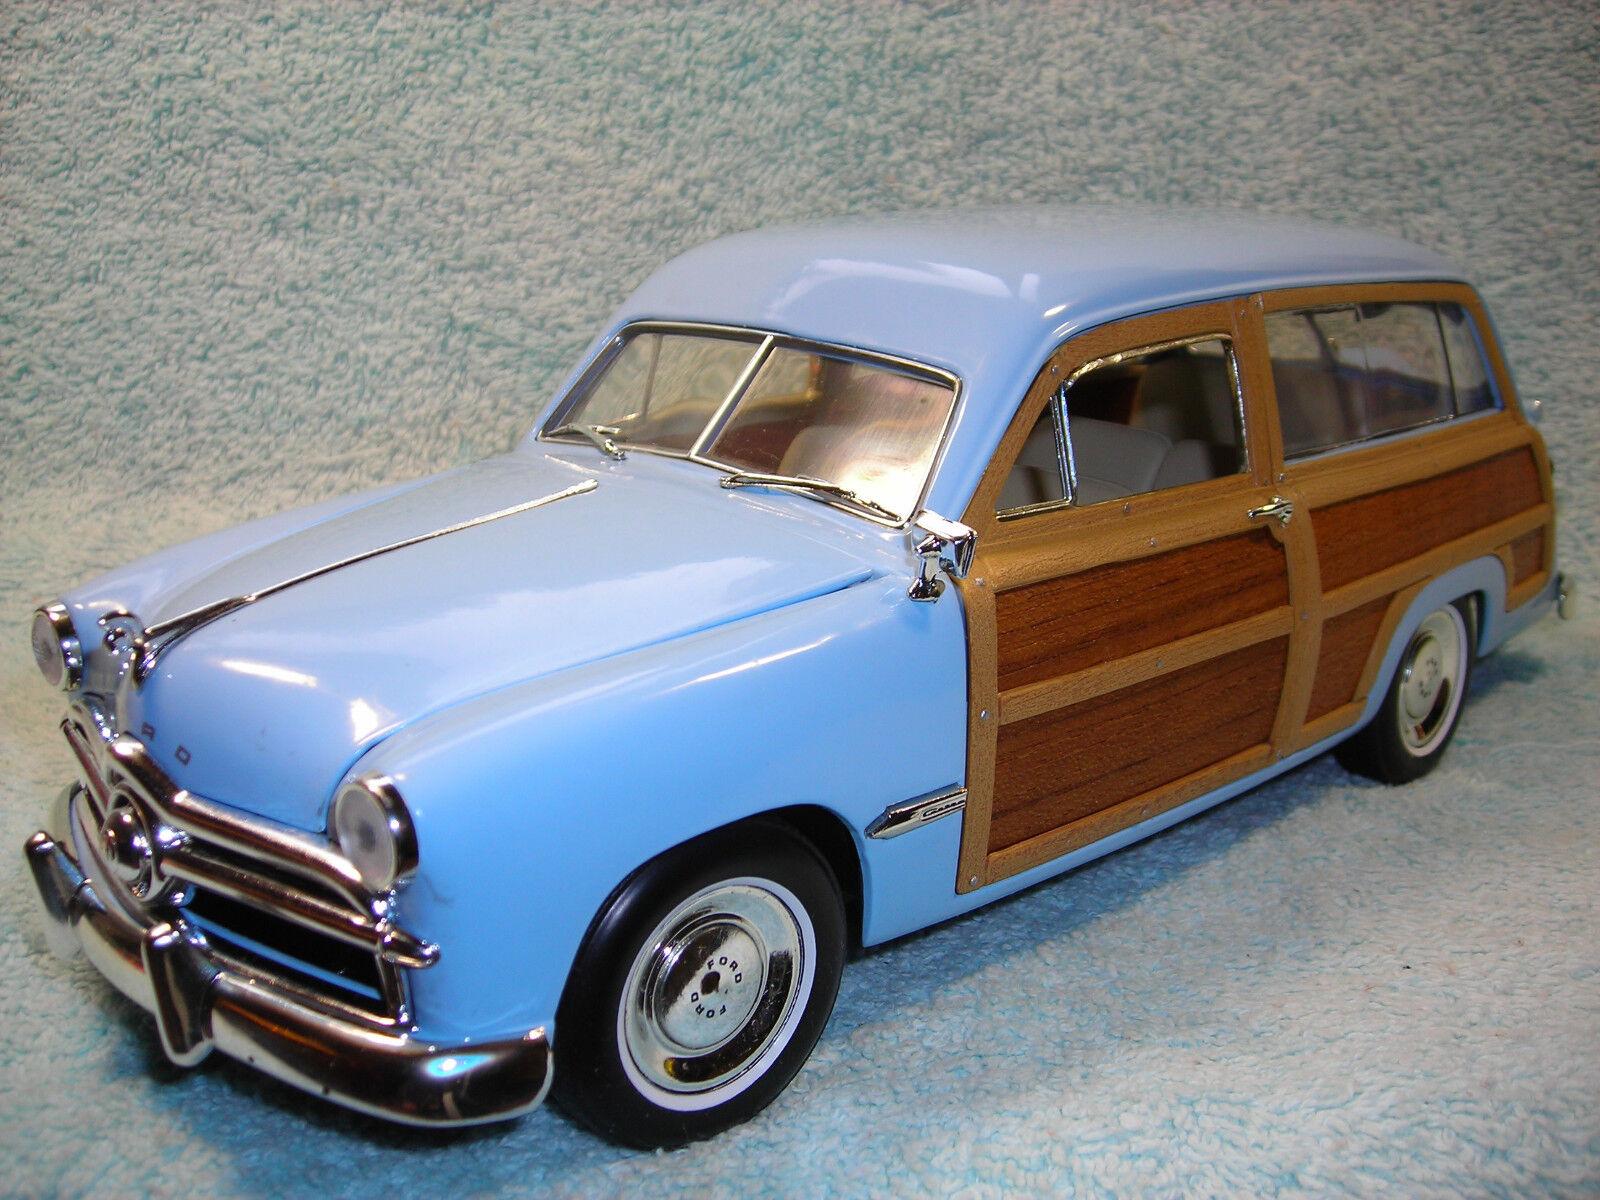 1/18 2018 Ford Woody Wagon en Bebé Azul \ Real Madera por motor City Classics.